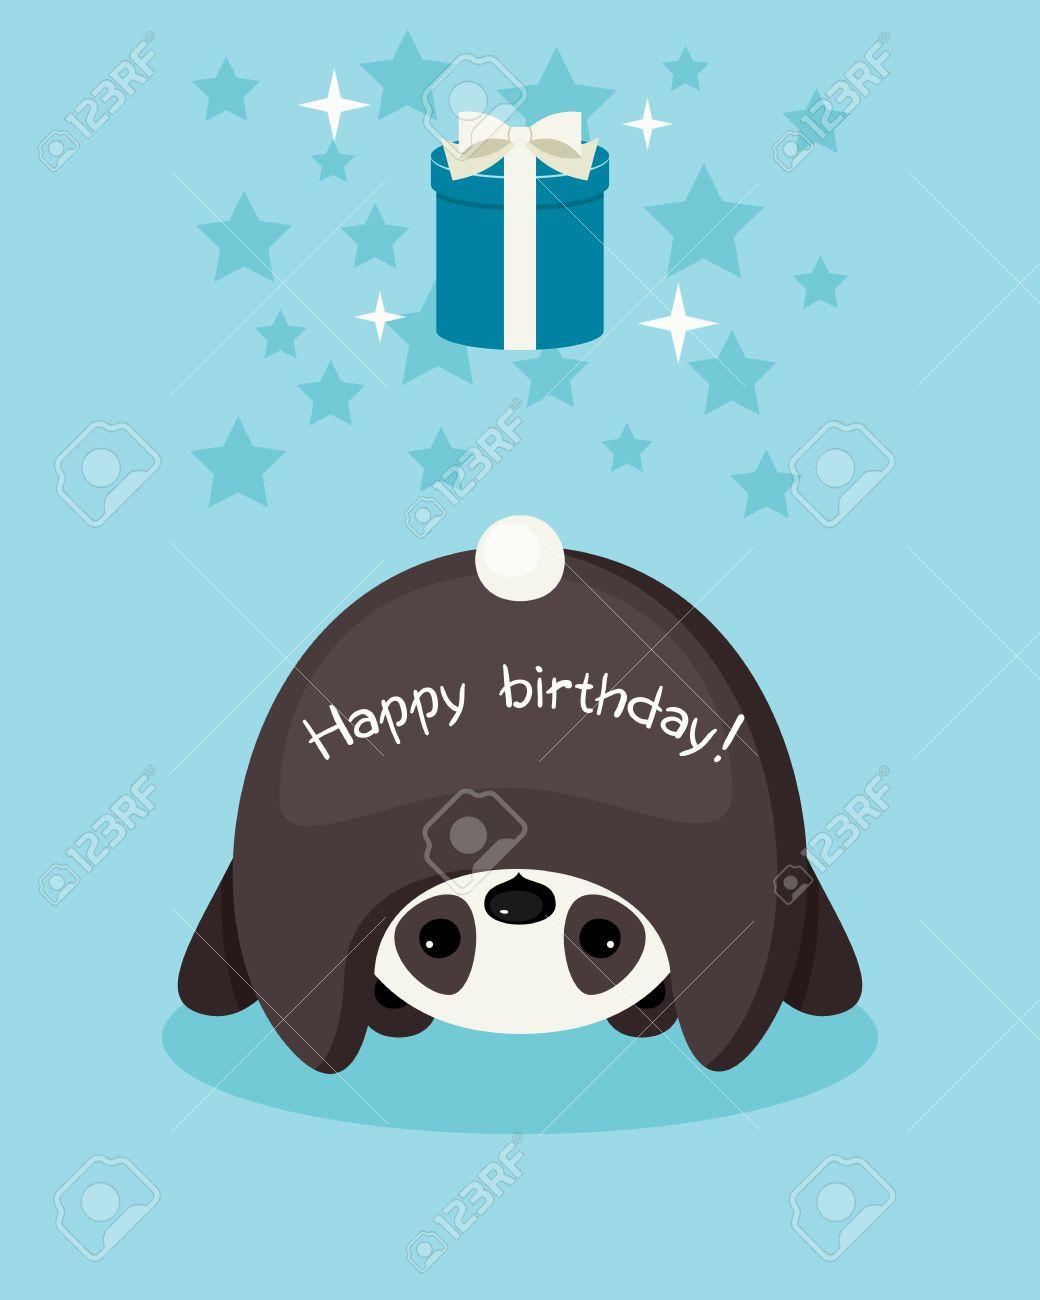 Birthday card upside down panda wishing a happy birthday gift birthday card upside down panda wishing a happy birthday gift box with bow bookmarktalkfo Choice Image